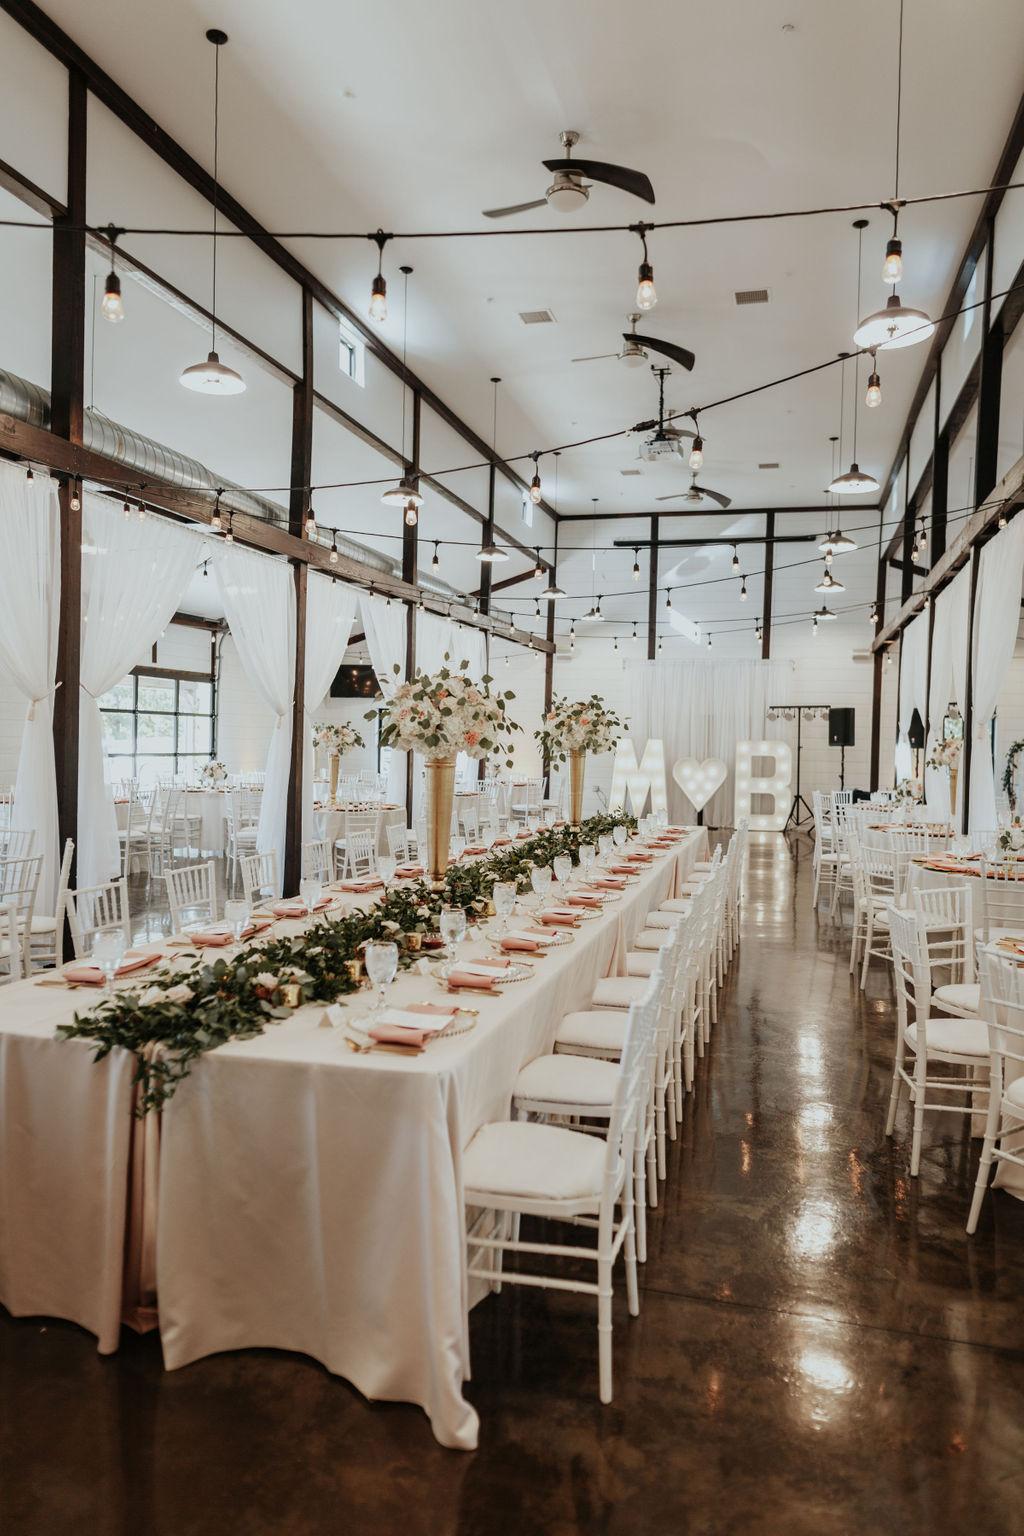 Best Oklahoma Outdoor Wedding Venue Tulsa Bixby White Barn 36.jpg